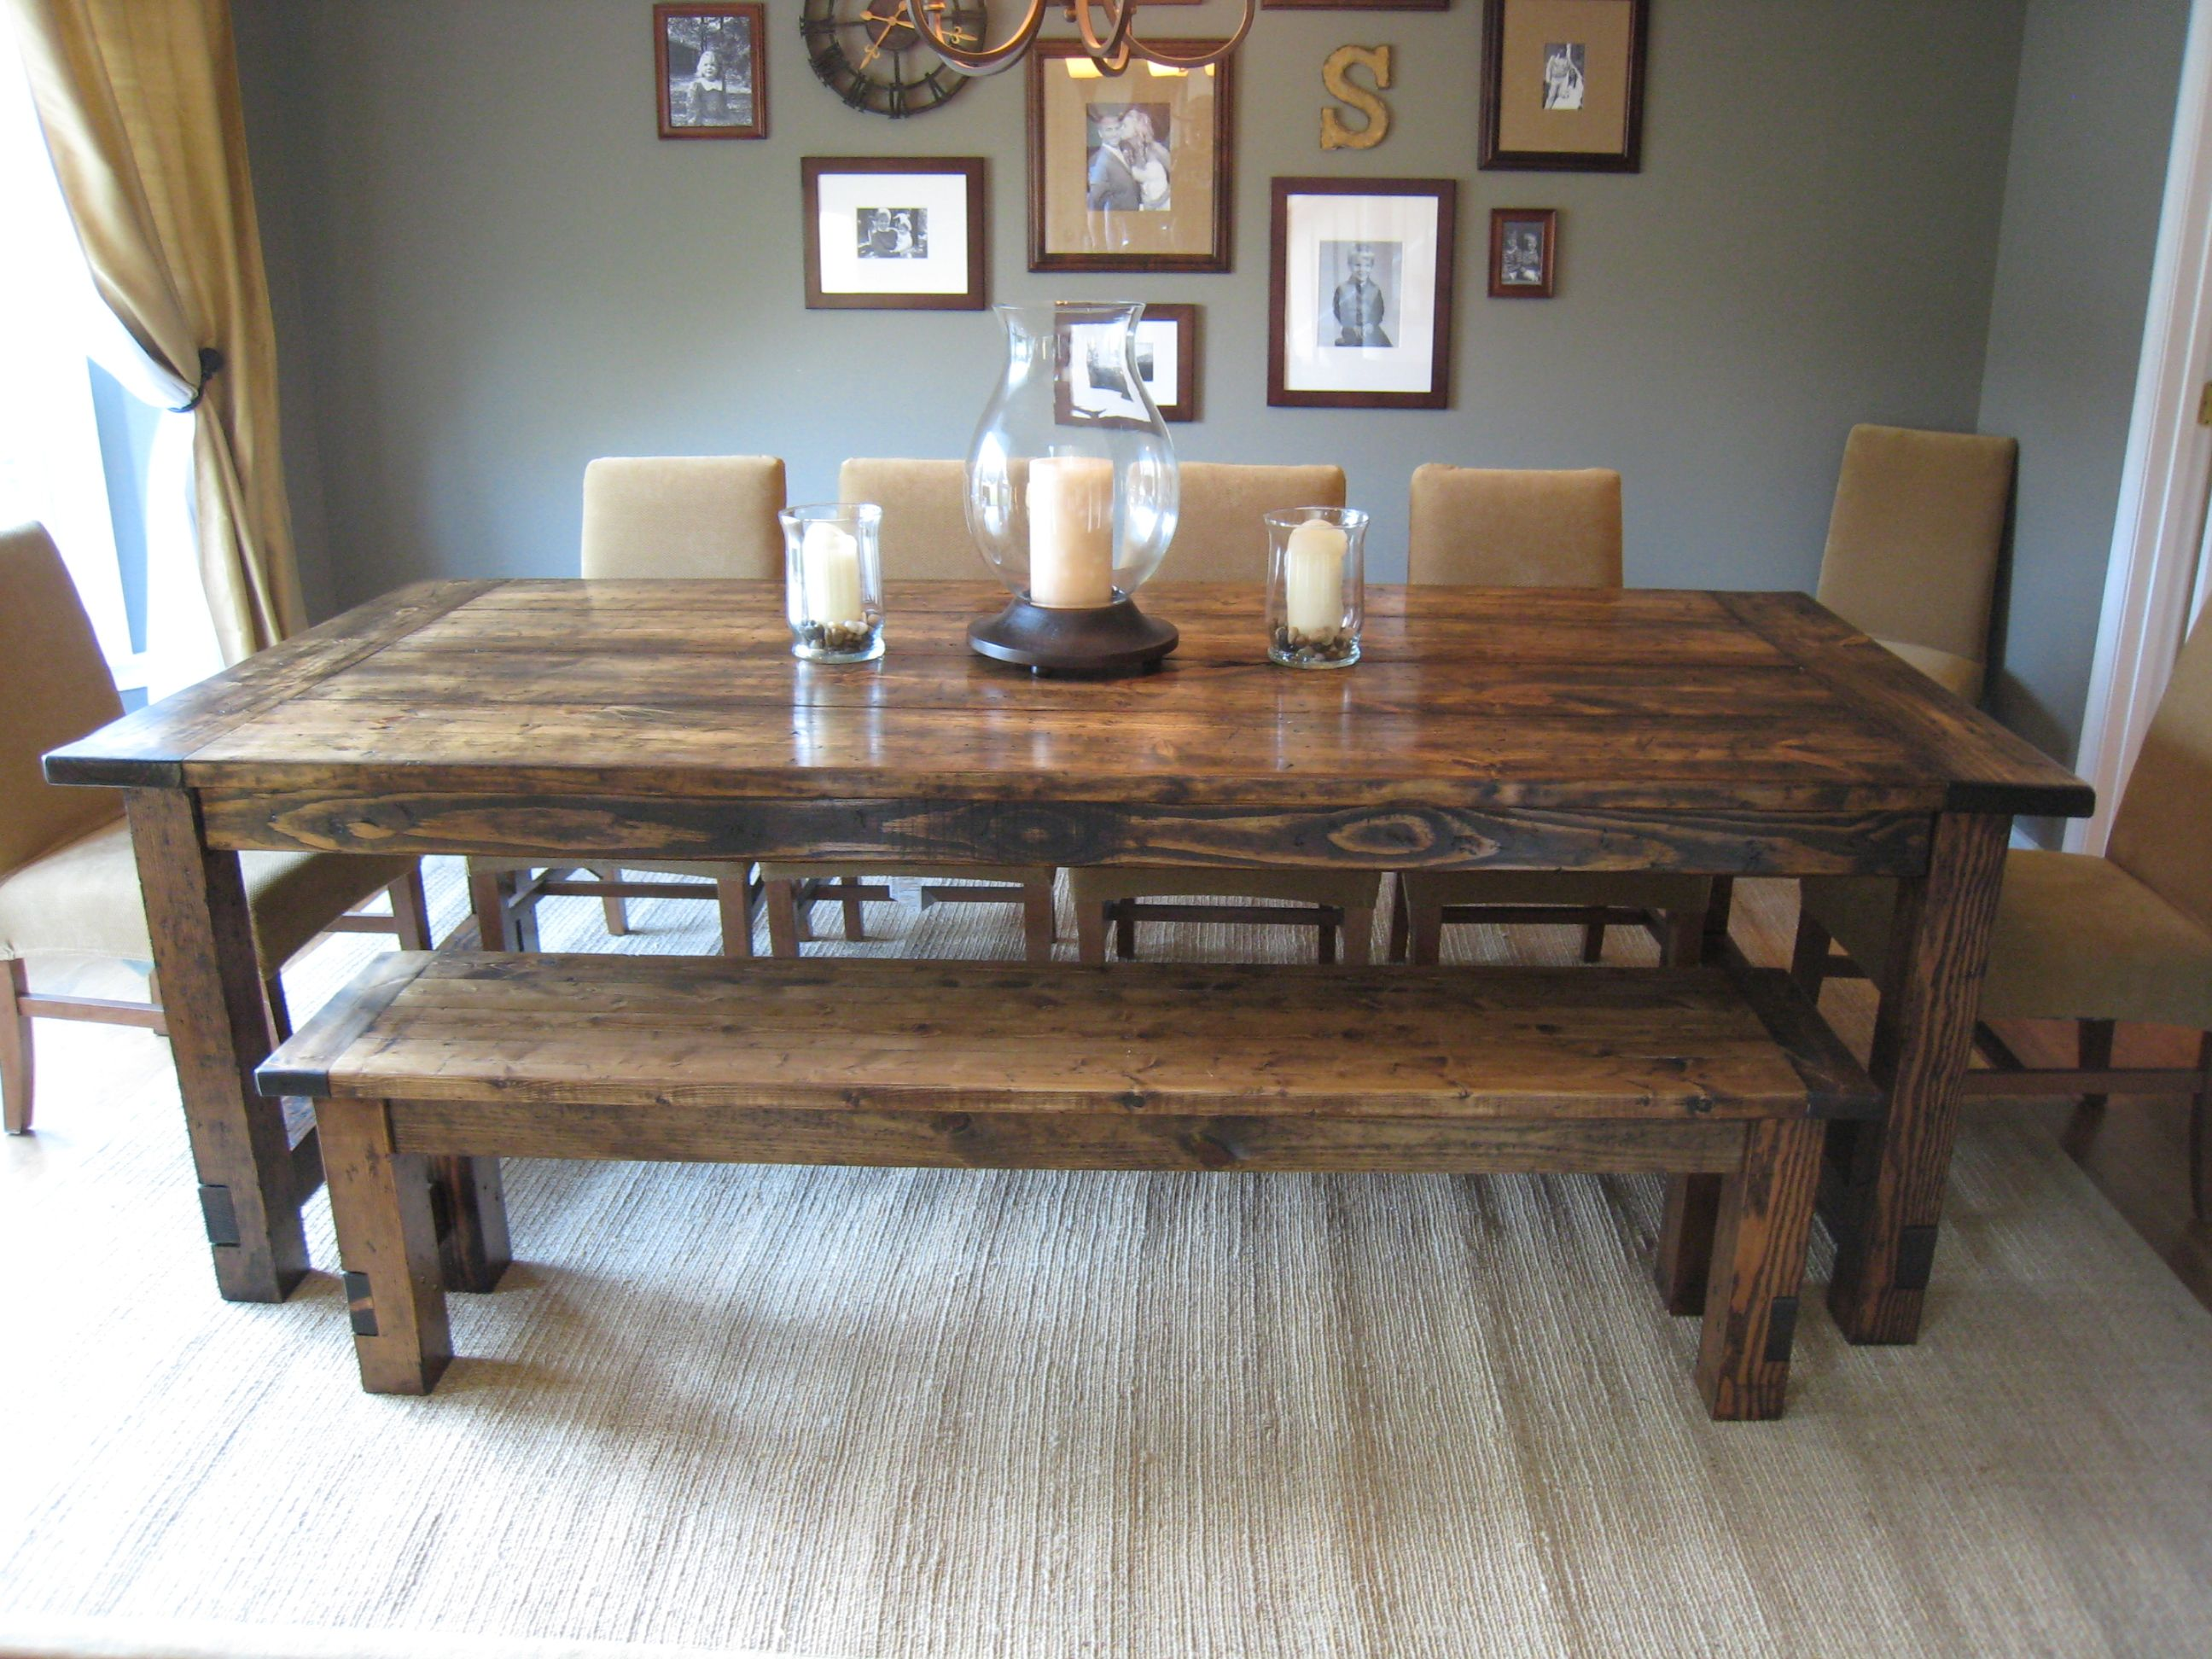 Prime Restoration Hardware Farmhouse Table Replica They Made It Interior Design Ideas Inesswwsoteloinfo